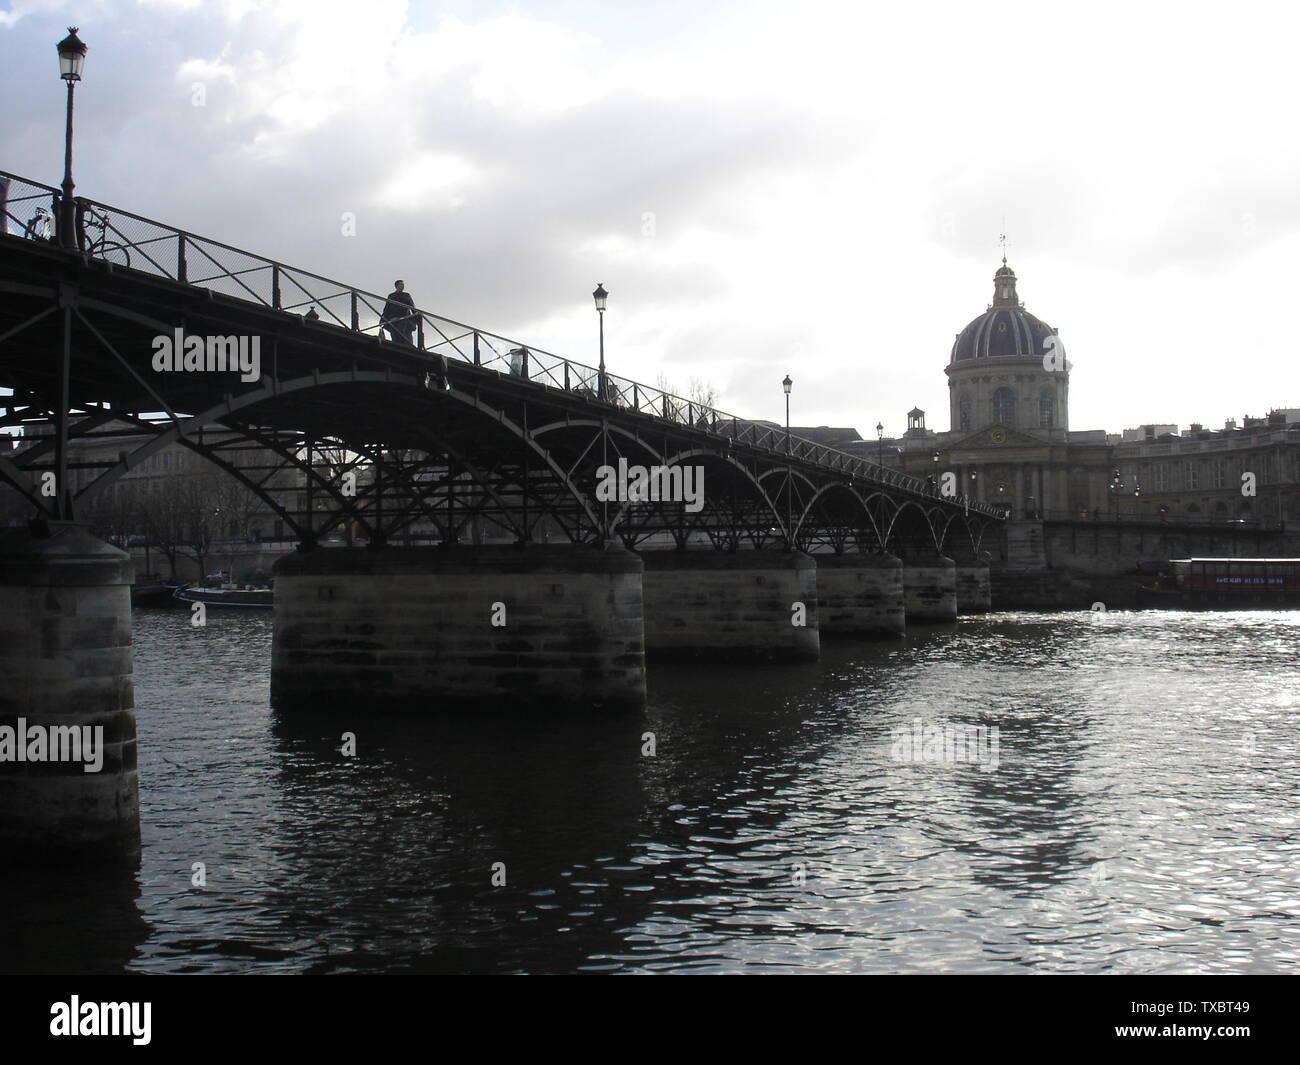 'Le Pont des Arts vu depuis les quais de la rive droite, avec l'Institut de France au fond.; 14 February 2006 (original upload date); Transferred from fr.wikipedia to Commons.; Mini.fb at French Wikipedia; ' - Stock Image